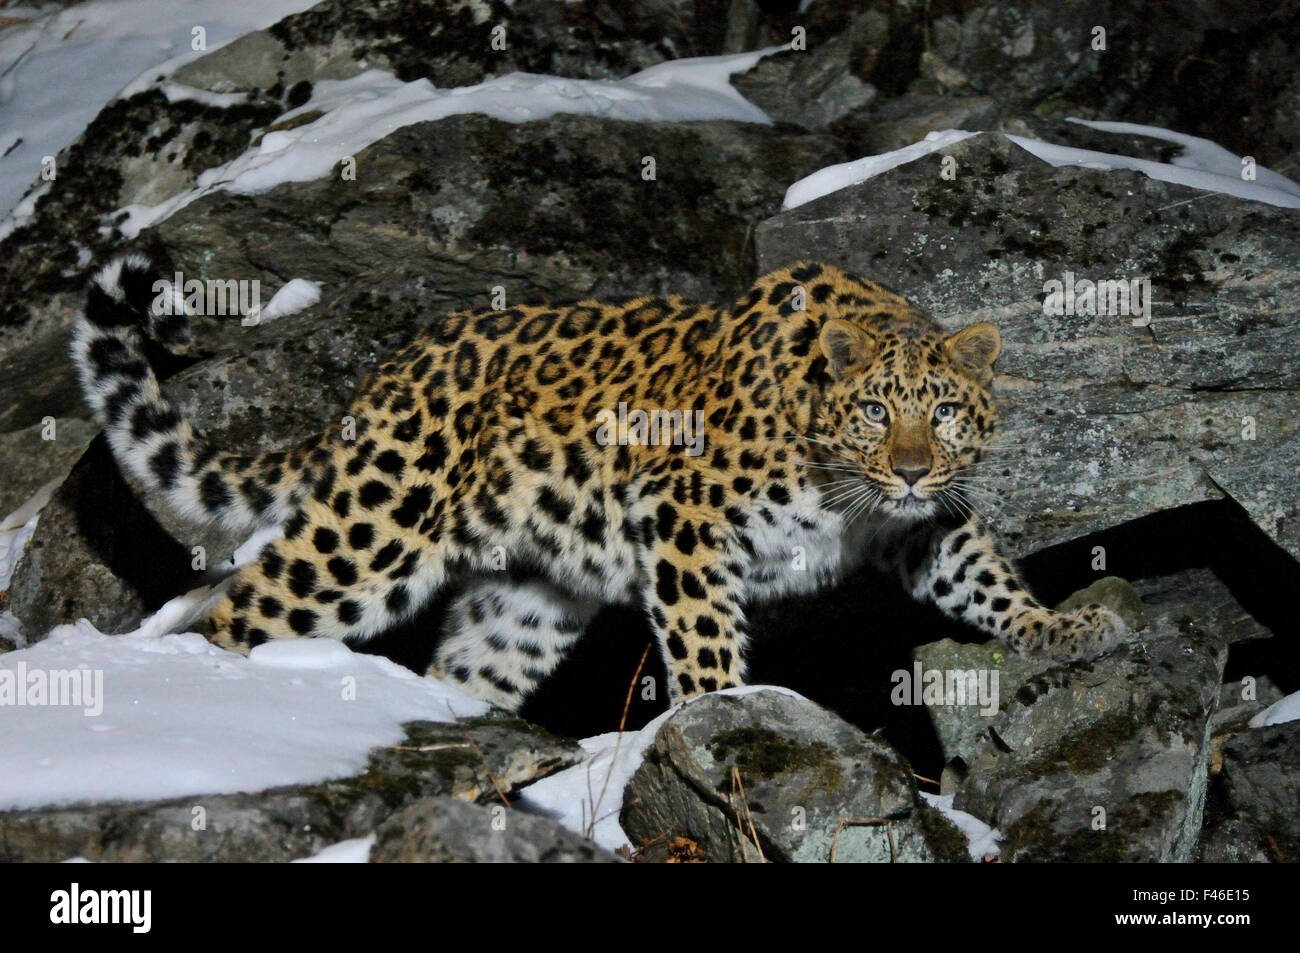 Wild female Amur leopard (Panthera pardus orientalis) on rocky hillside, Kedrovaya Pad reserve, Primorsky Krai, - Stock Image